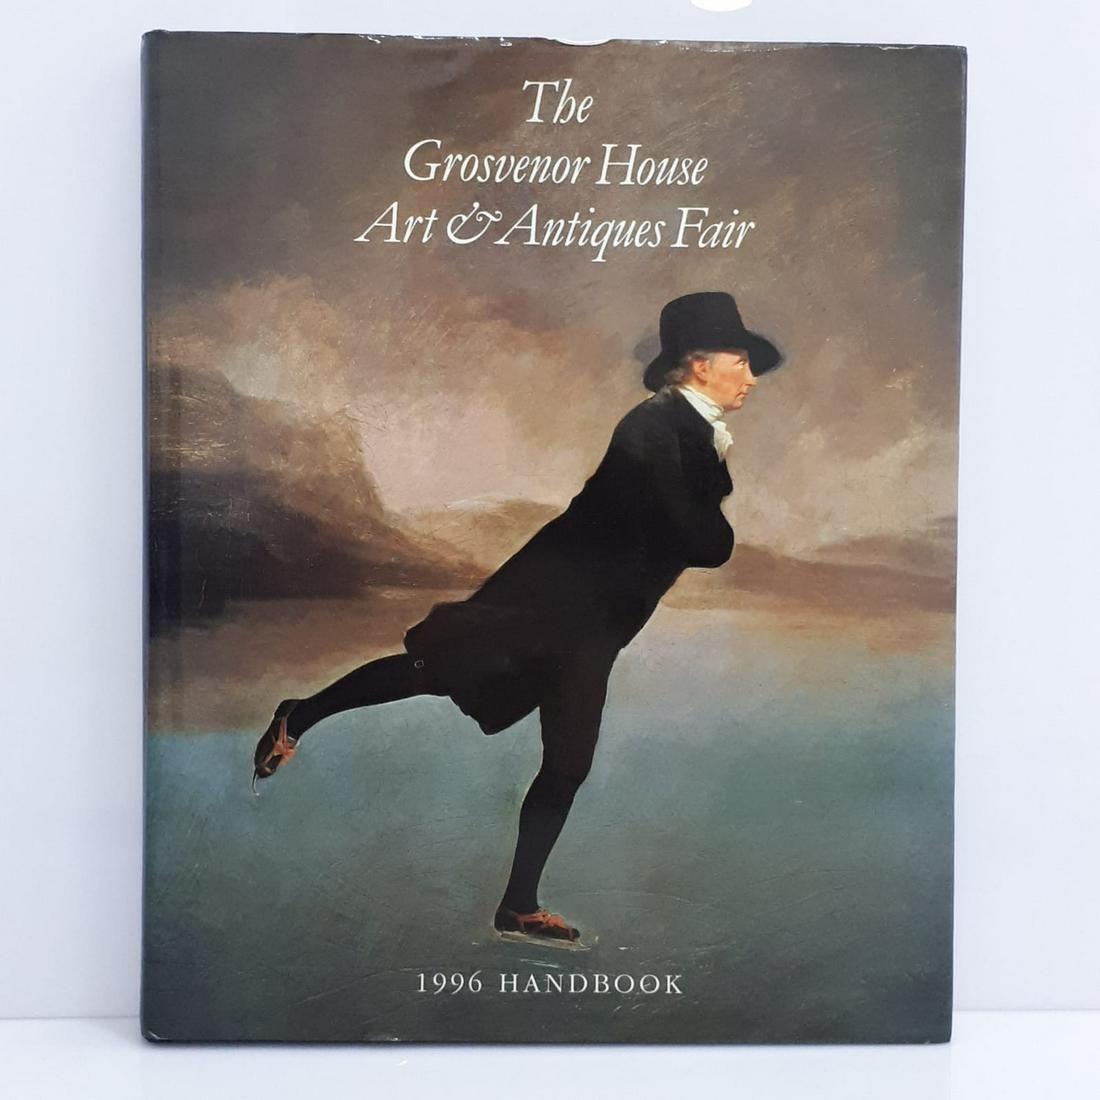 THE GROSVENOR HOUSE ART & ANTIQUES FAIR